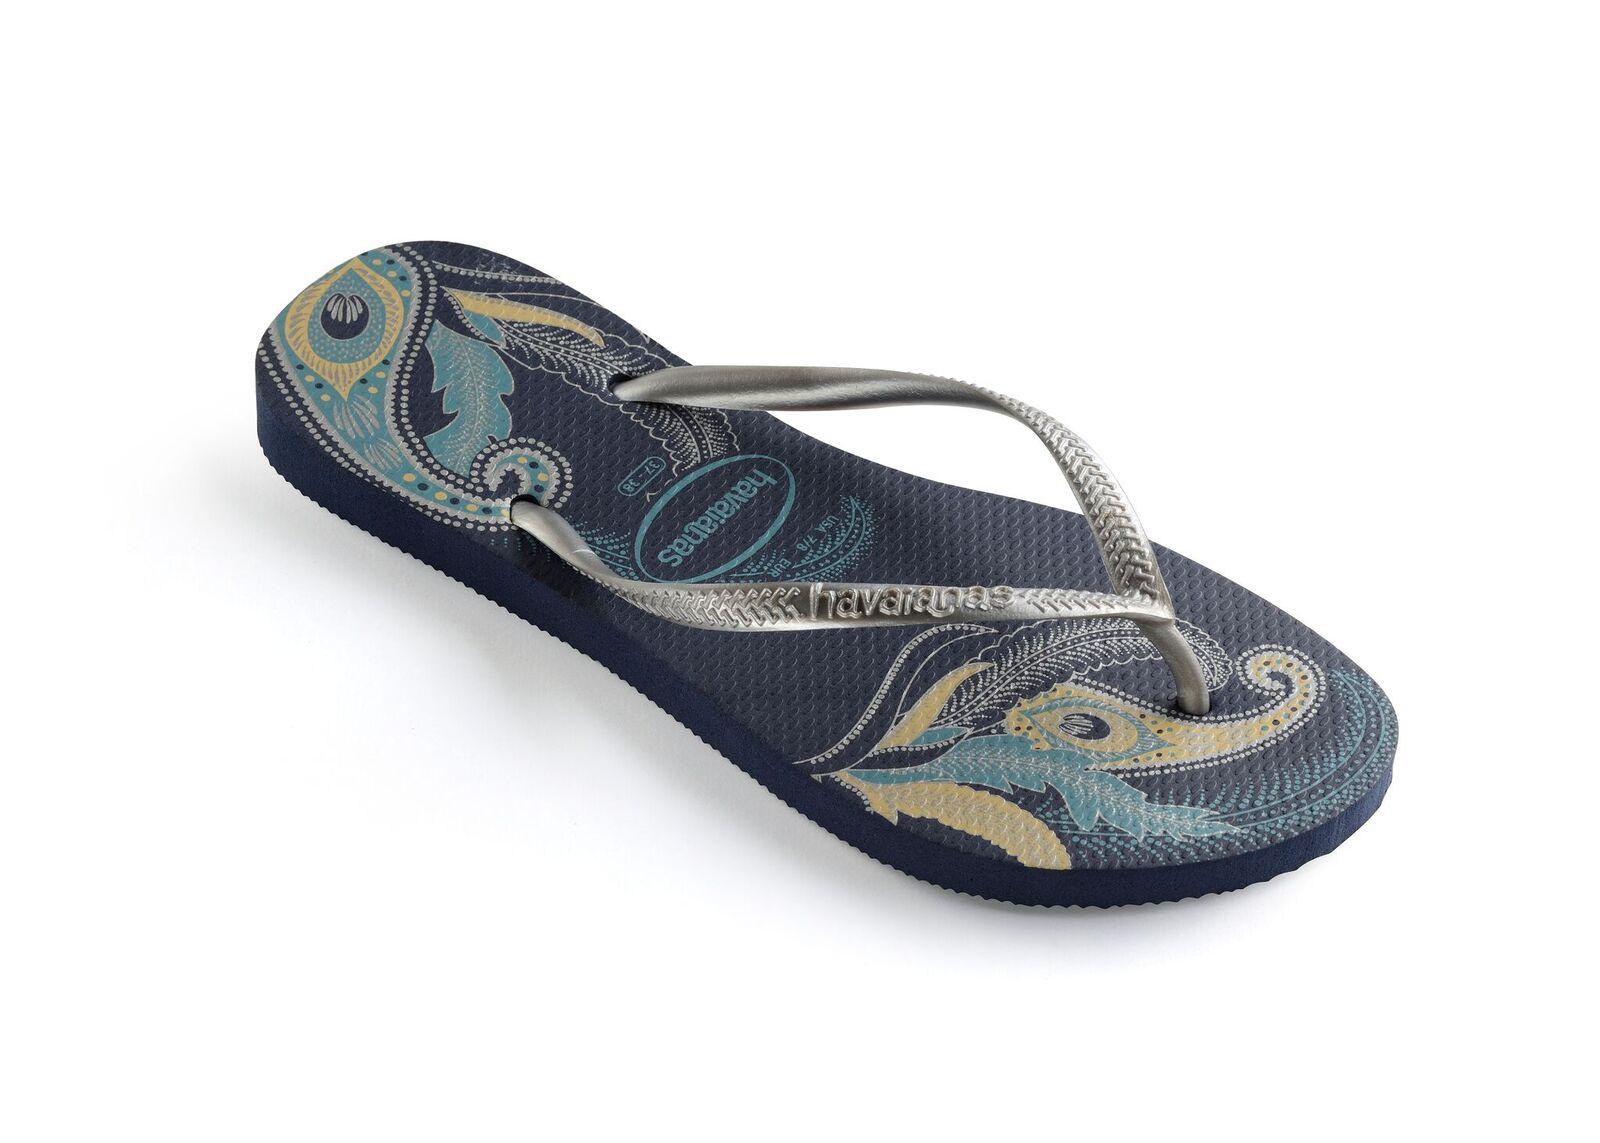 eaa6b8304643 Slim Organic - Havaianas - Womens Footwear-Jandals   Mariposa ...